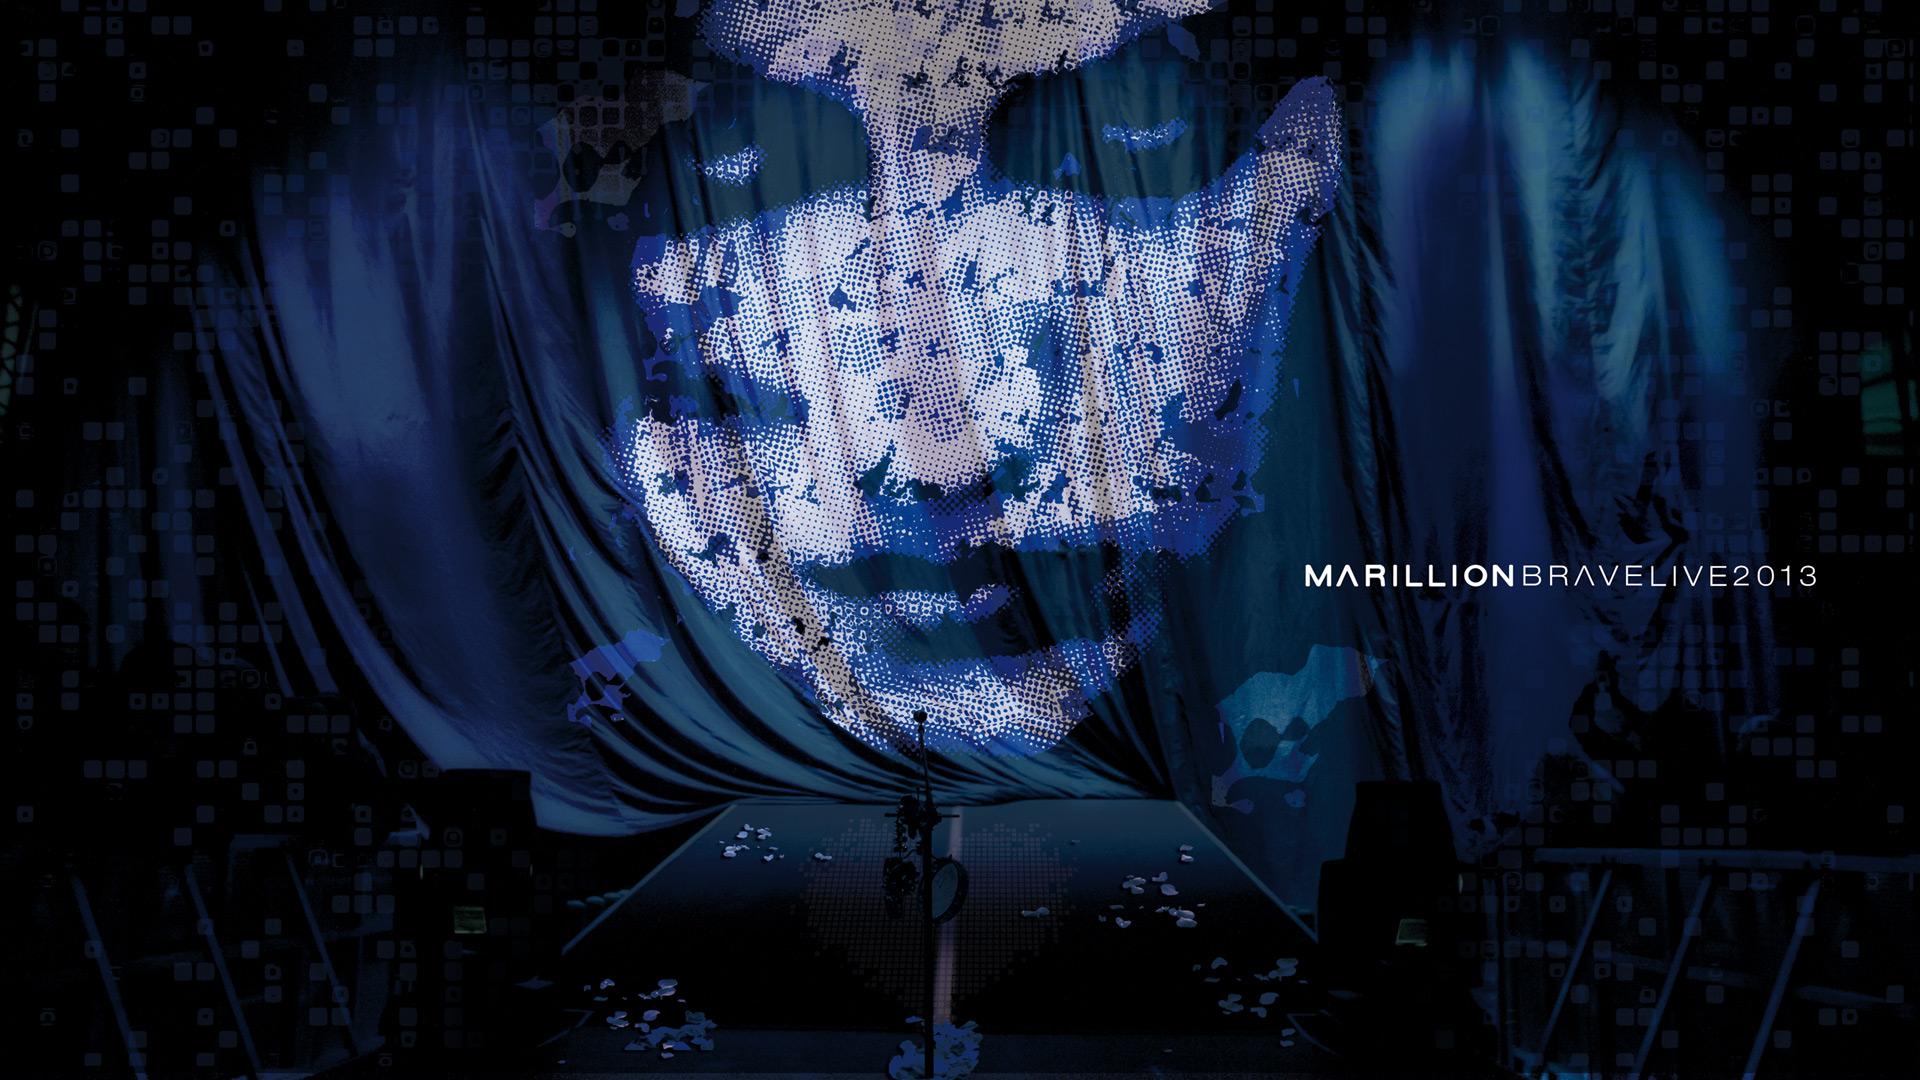 Marillion Script For A Jesters Tear Partitura Para El Llanto De Un Bufon